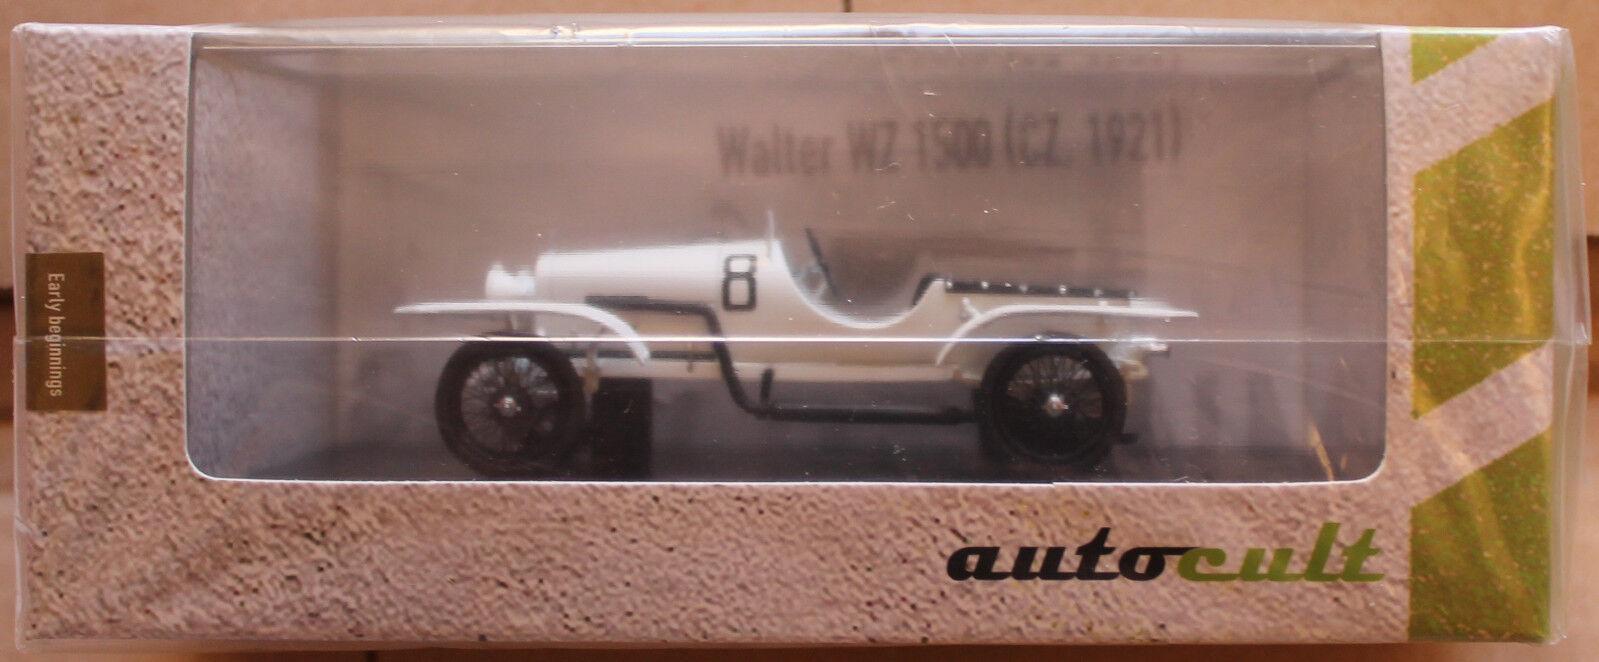 Autocult 1 43  01002 Walter augmentera 1500 (1921)